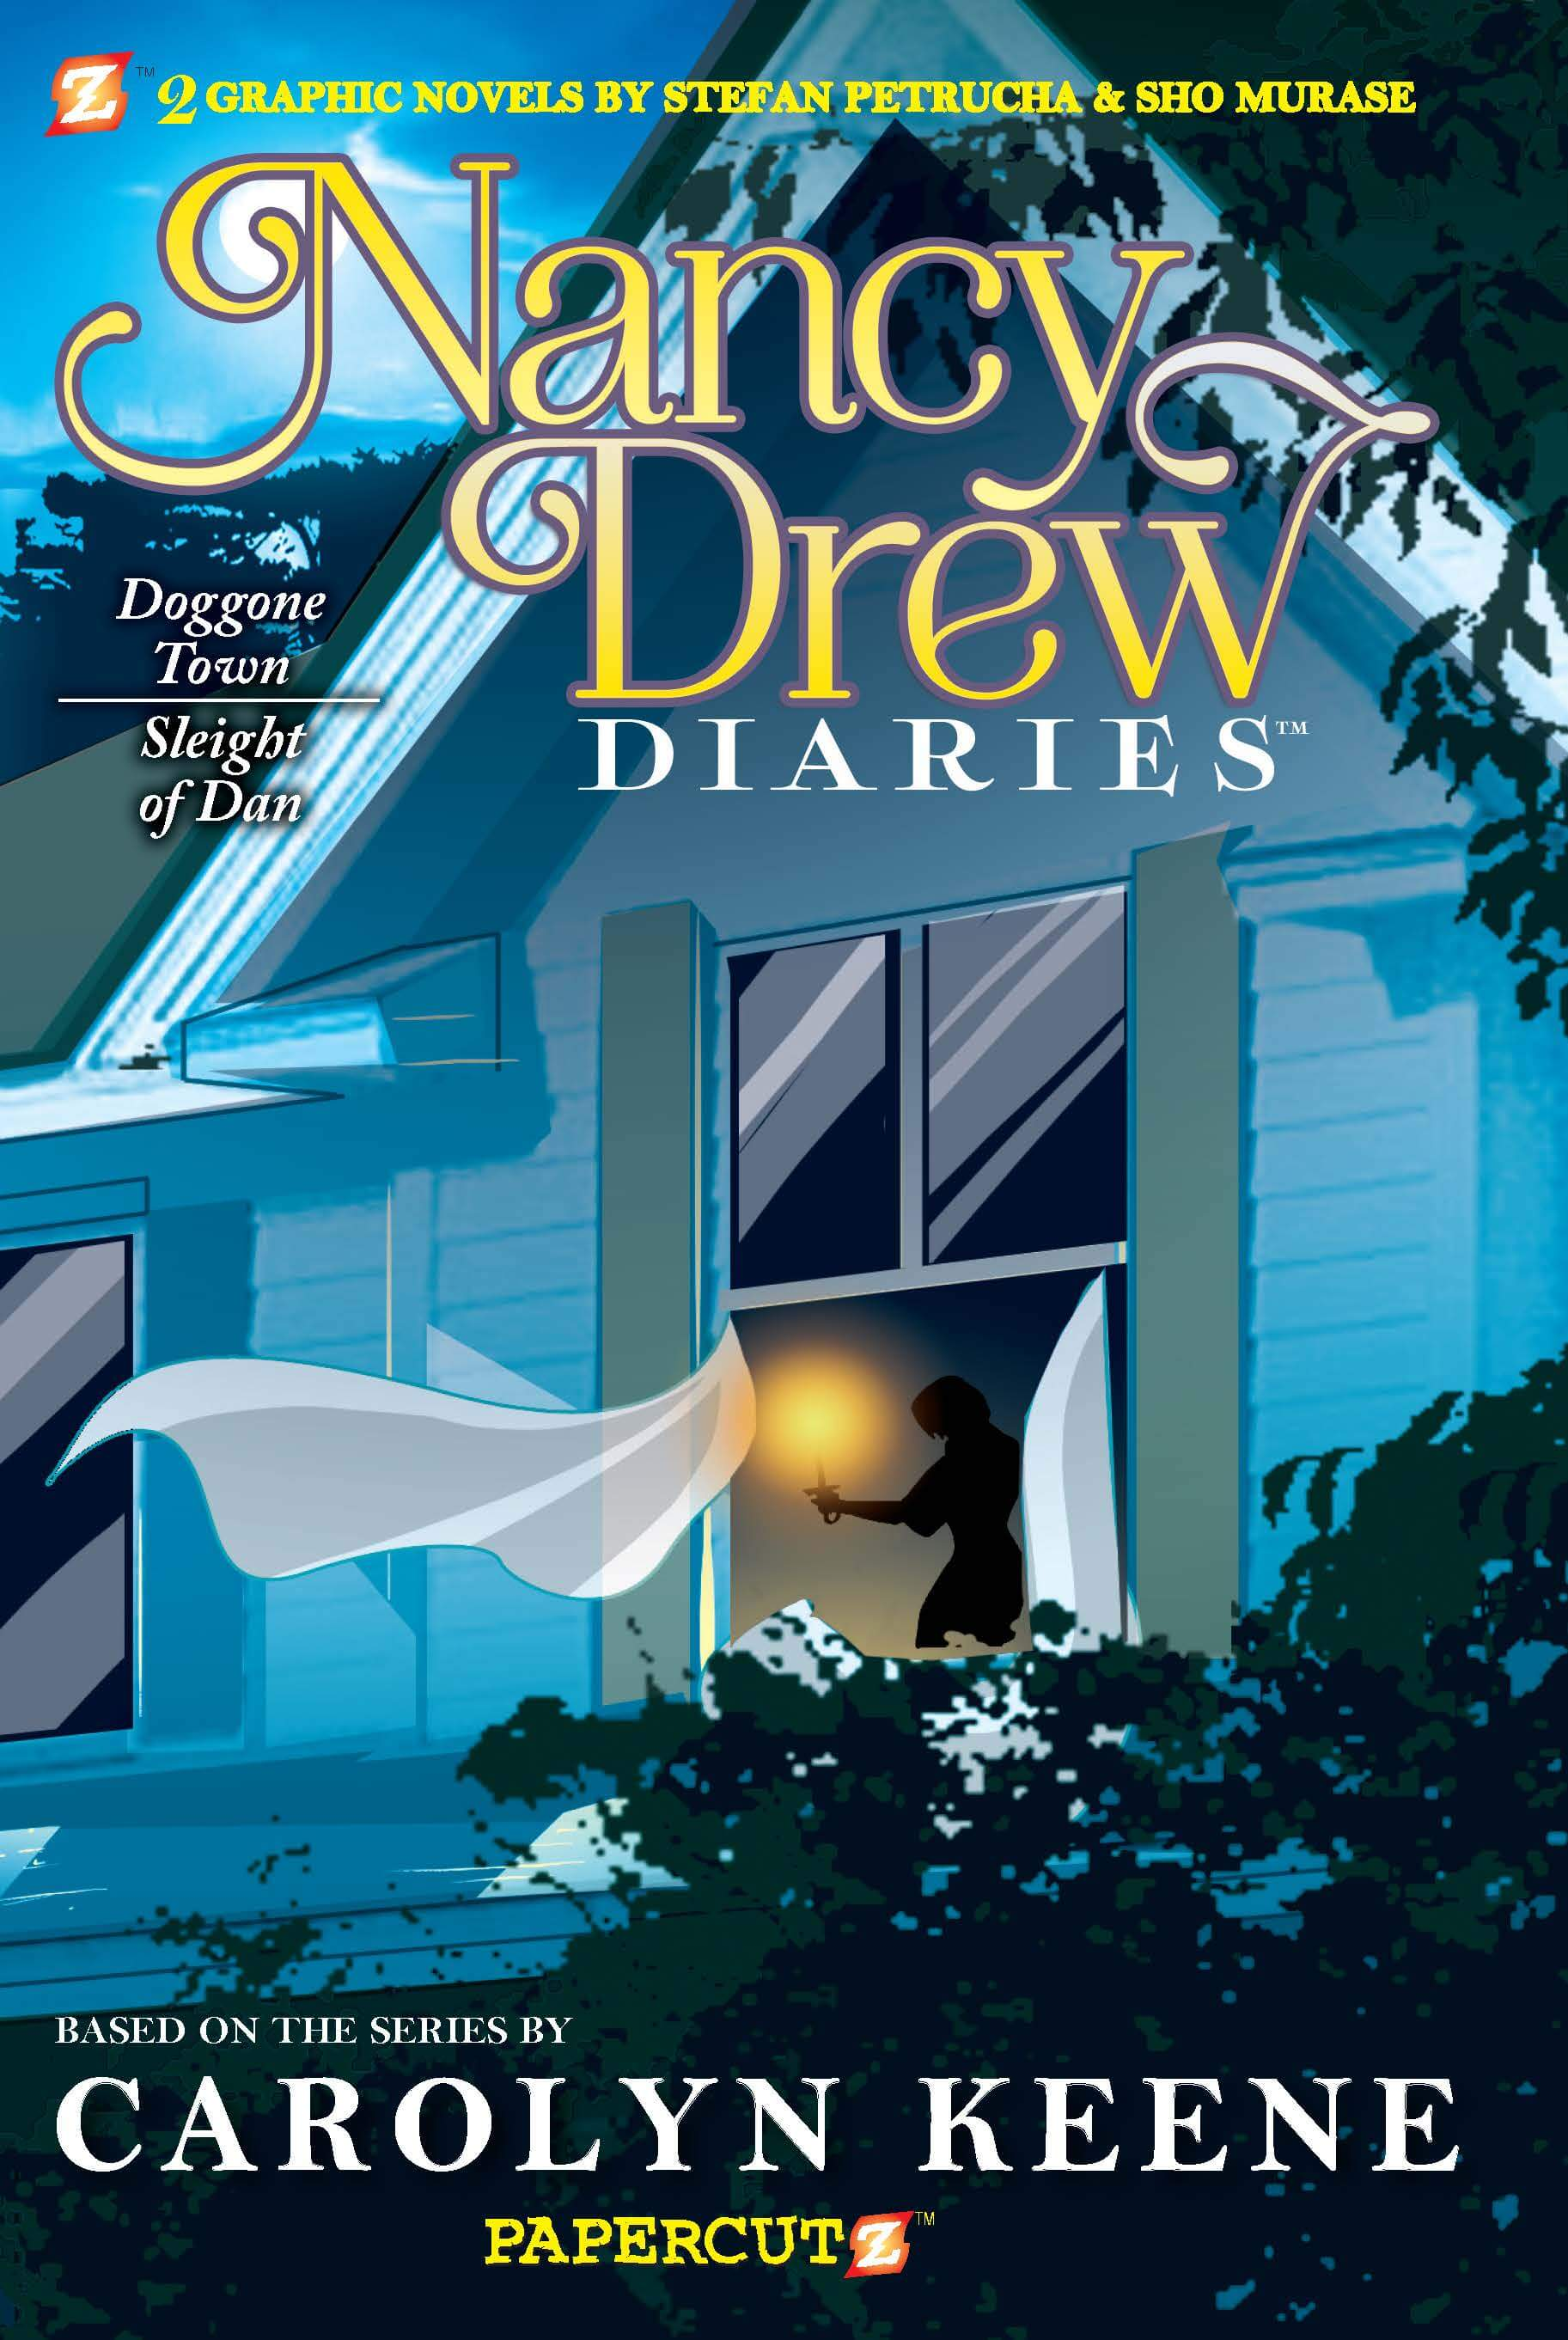 Nancy Drew Diaries #7